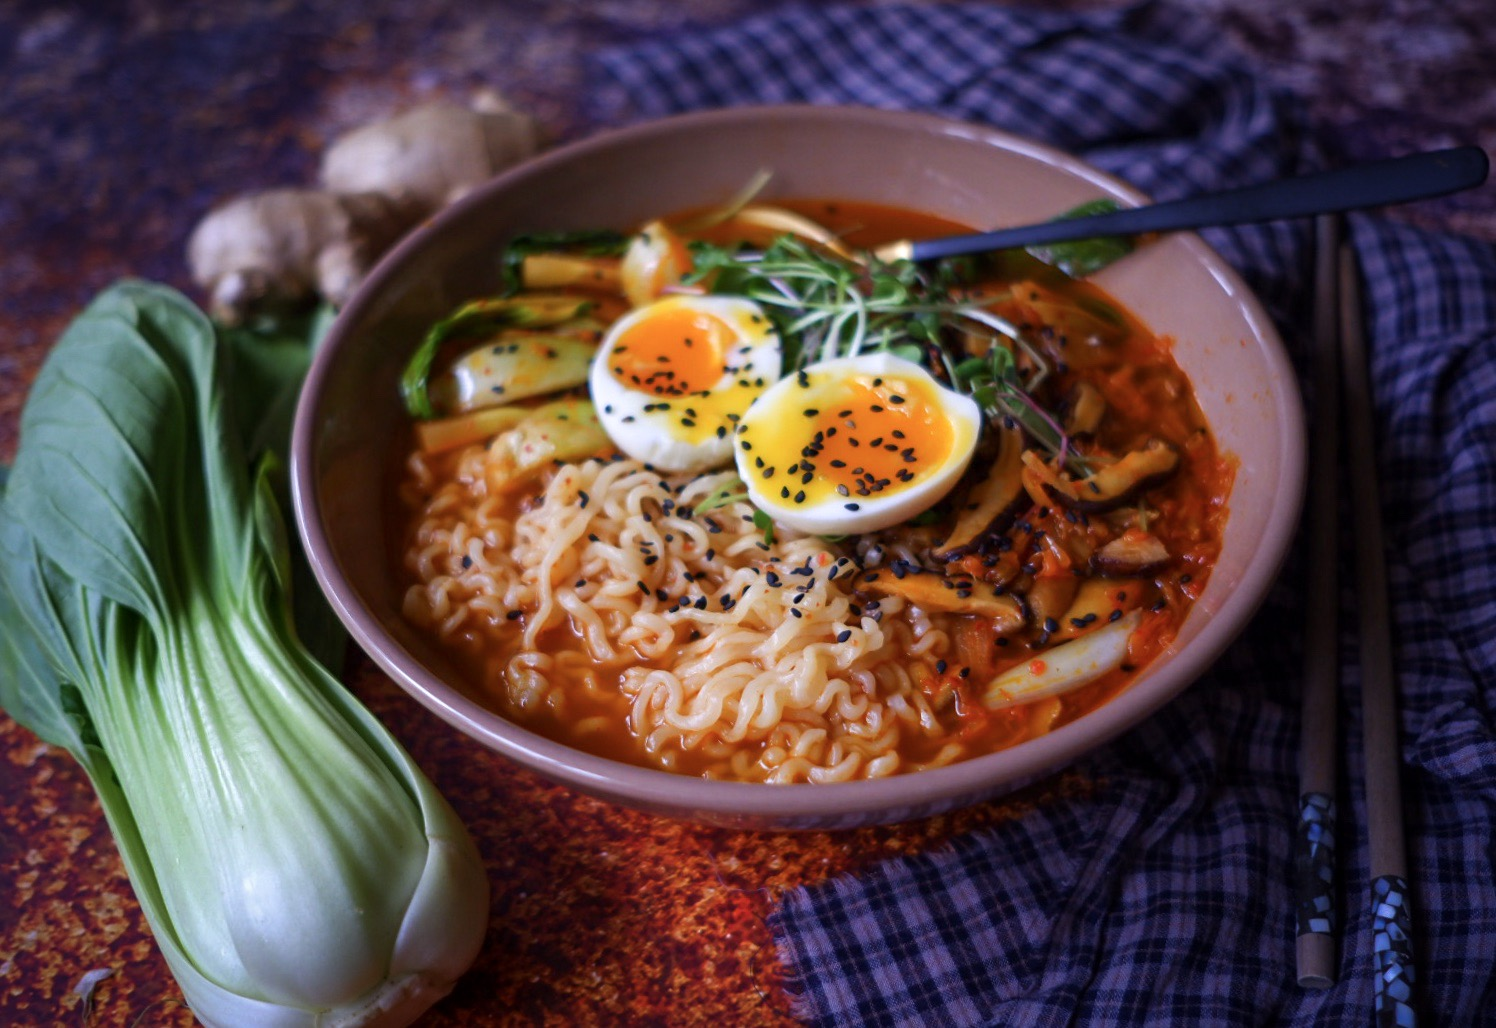 S Klárou v kuchyni: Jednoduchý kimchi ramen